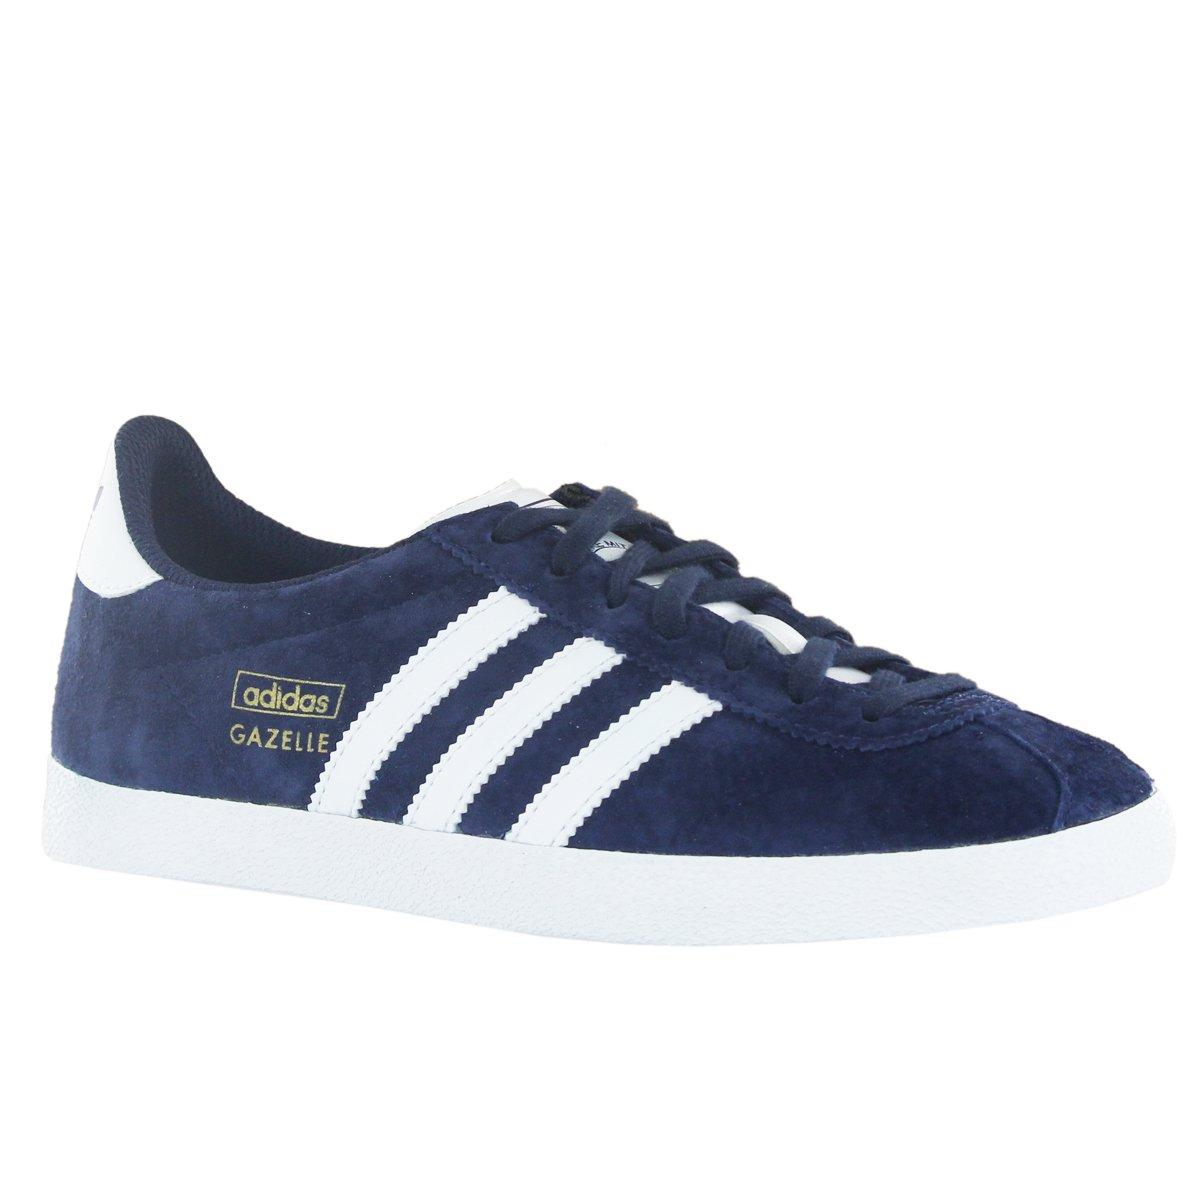 7b7381a2d568a7 Adidas Gazelle OG Blue White Womens Trainers Size 4 UK  Amazon.co.uk  Shoes    Bags